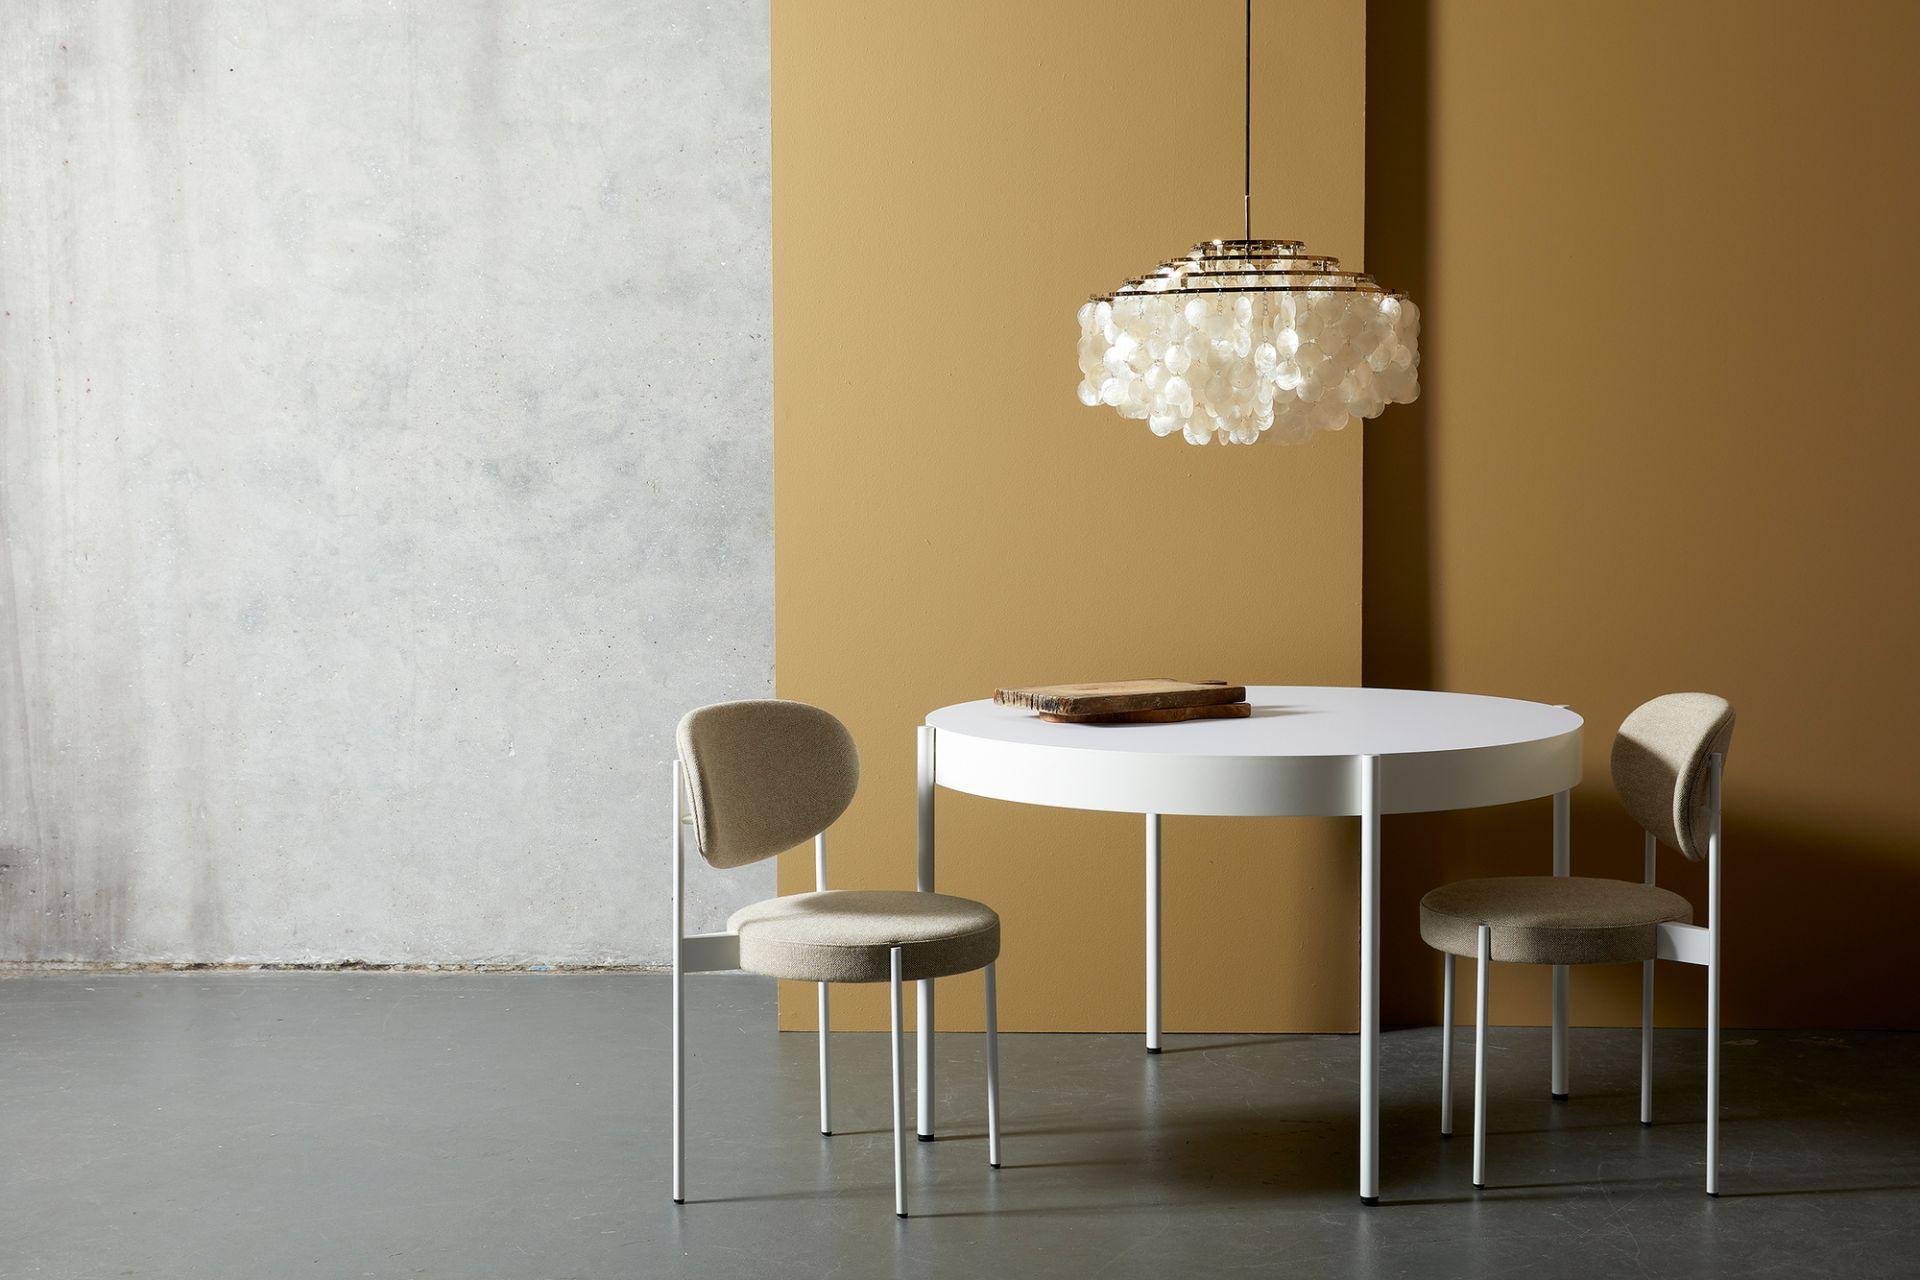 Series 430 Tisch Schwarz Ø120 Verpan